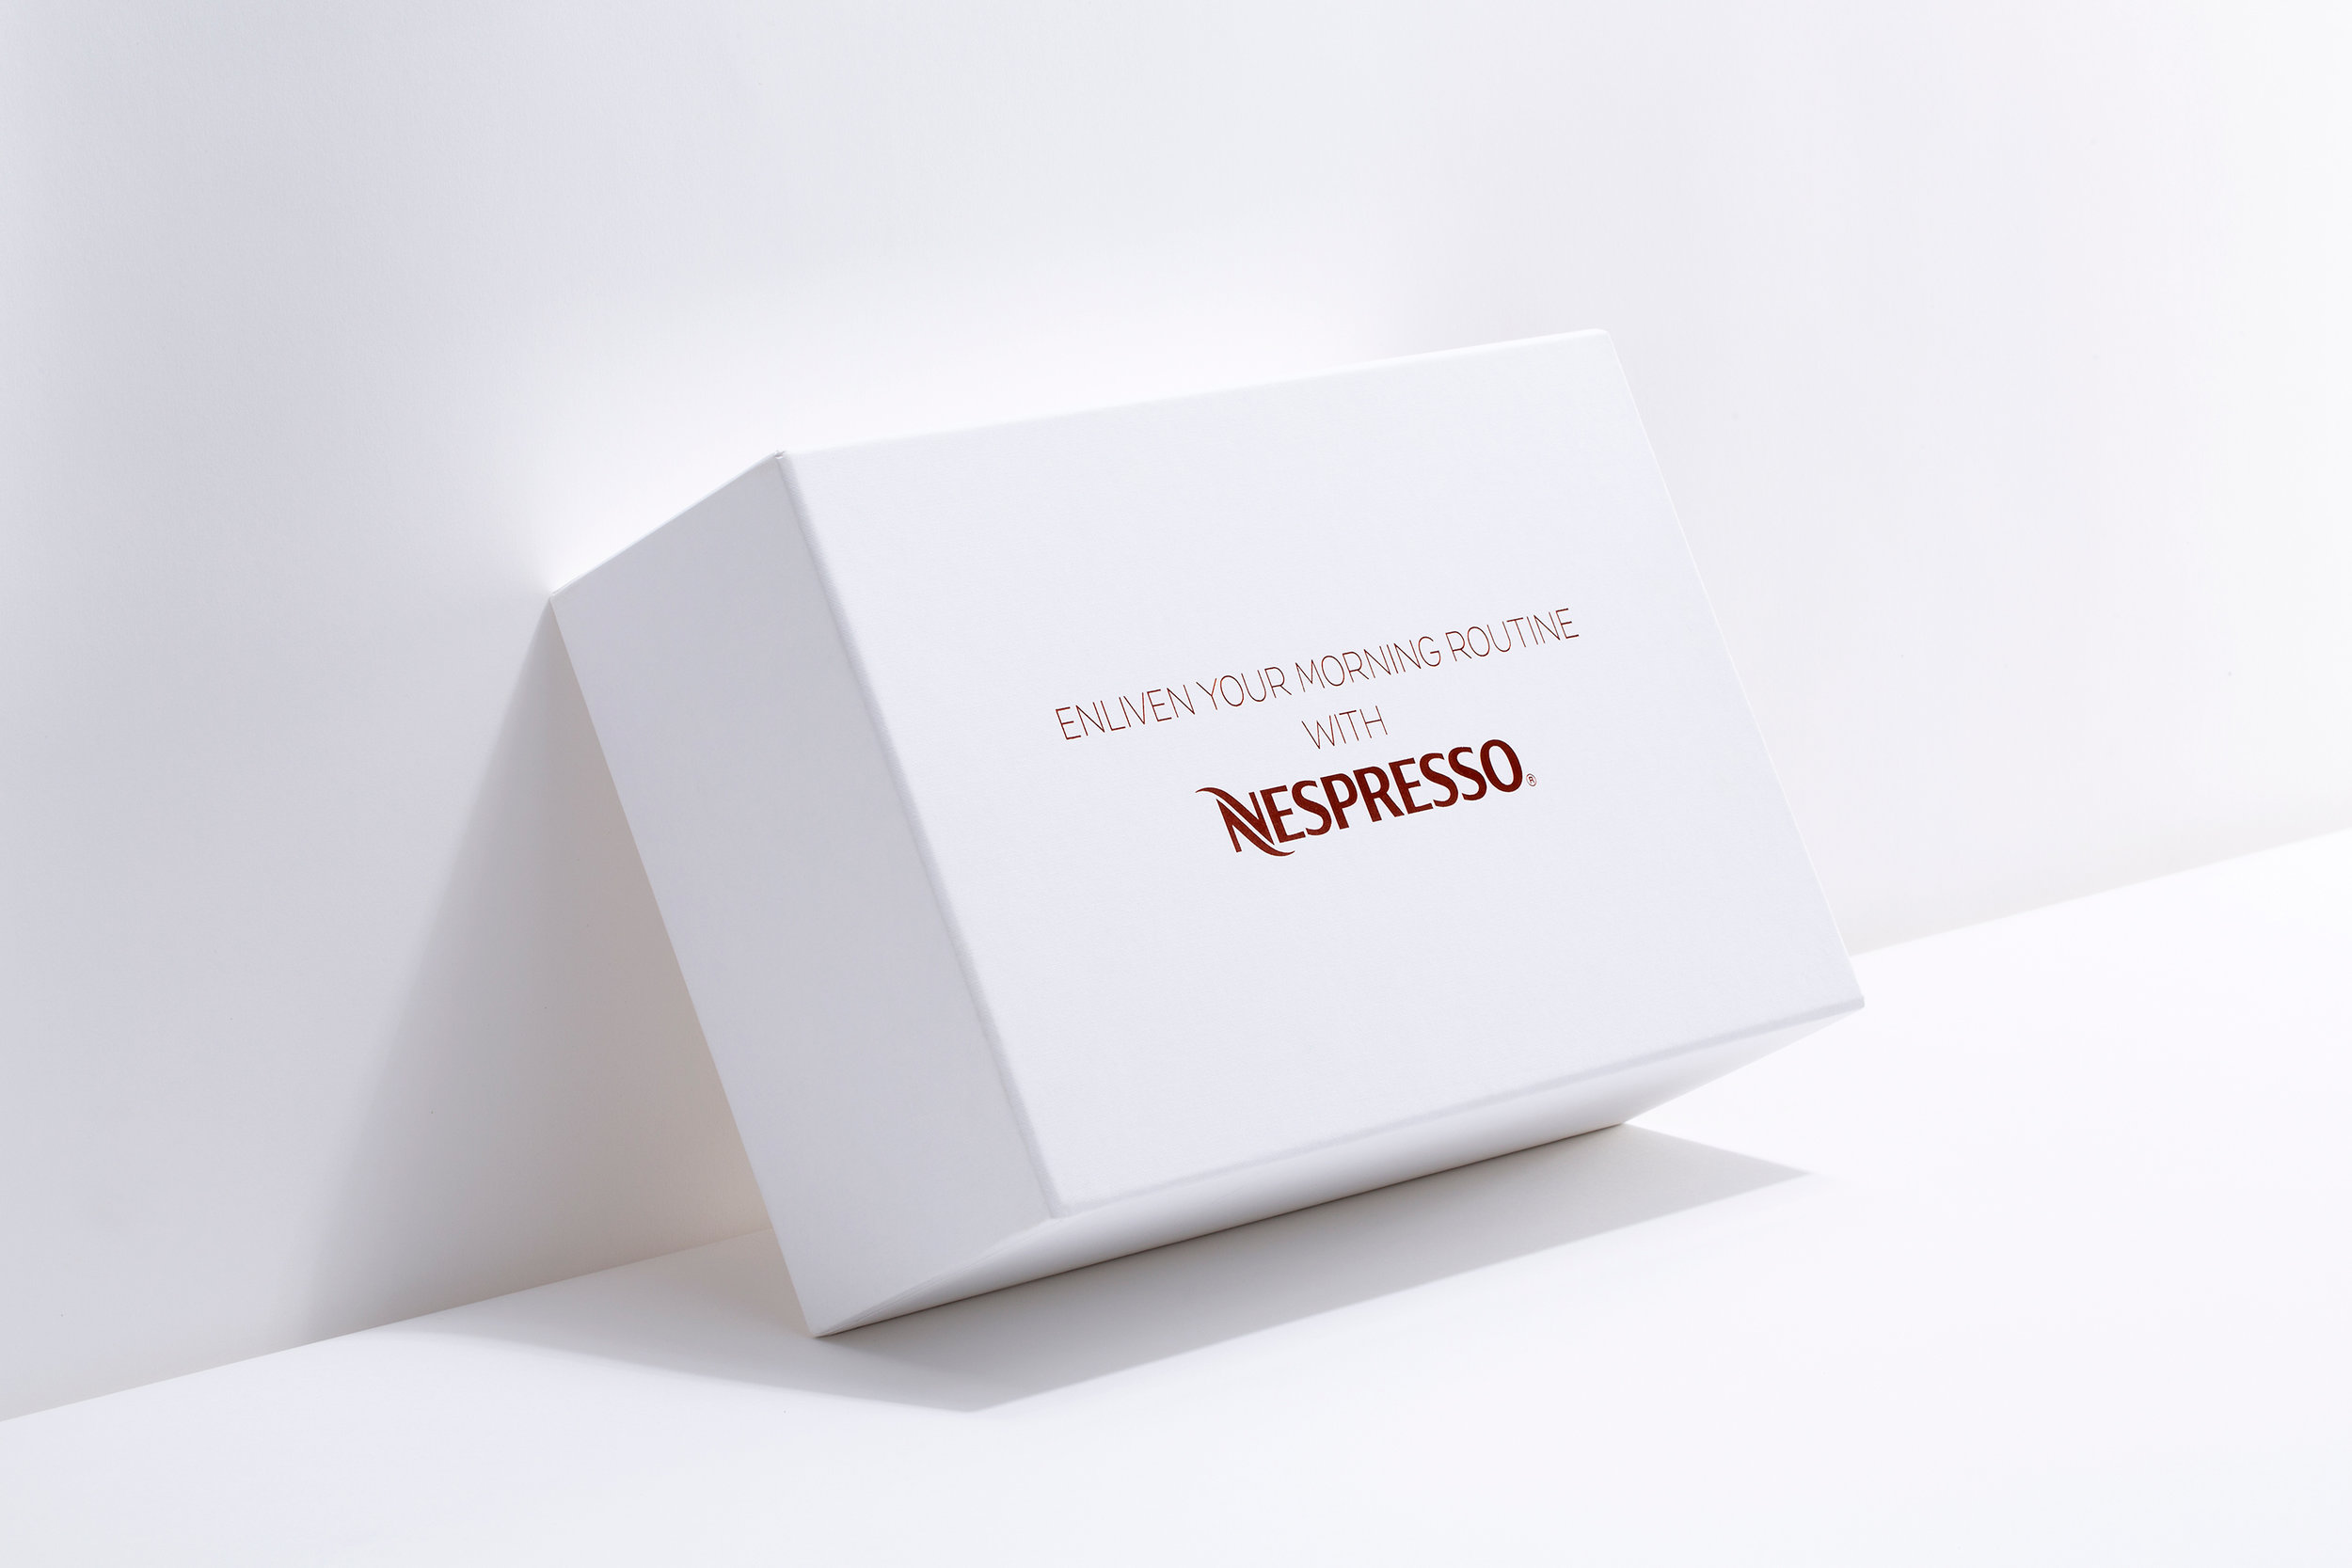 nespresso_envivo_2.jpg